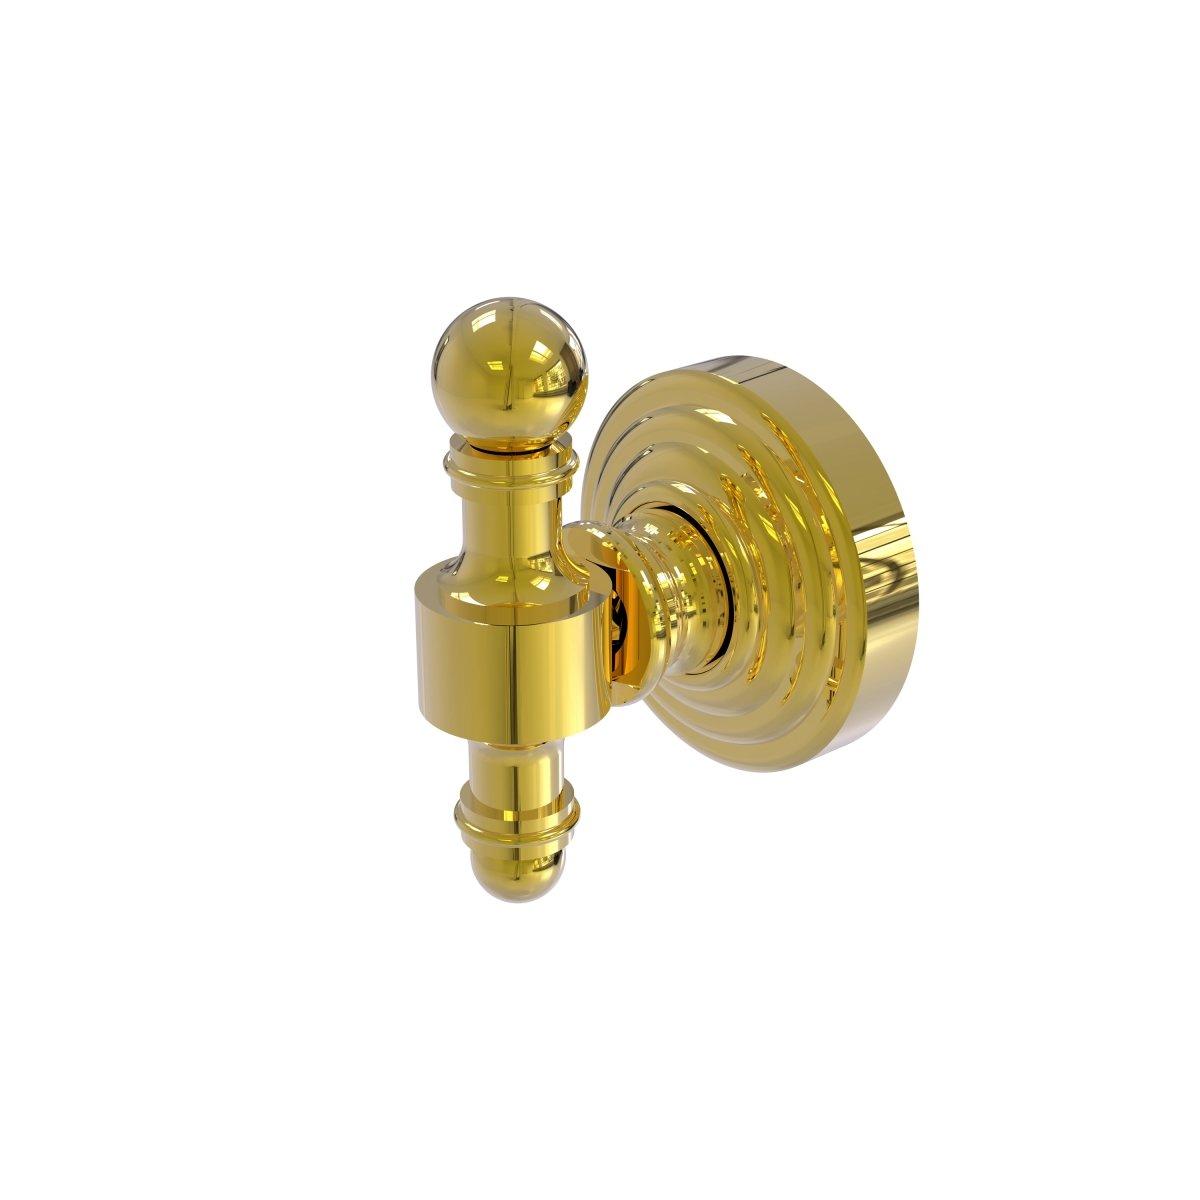 (Unlacquered Brass) RW-20-UNL Retro Wave Collection Robe Hook, Unlacquered Brass B06X9WX2K1ラッカーなし真鍮